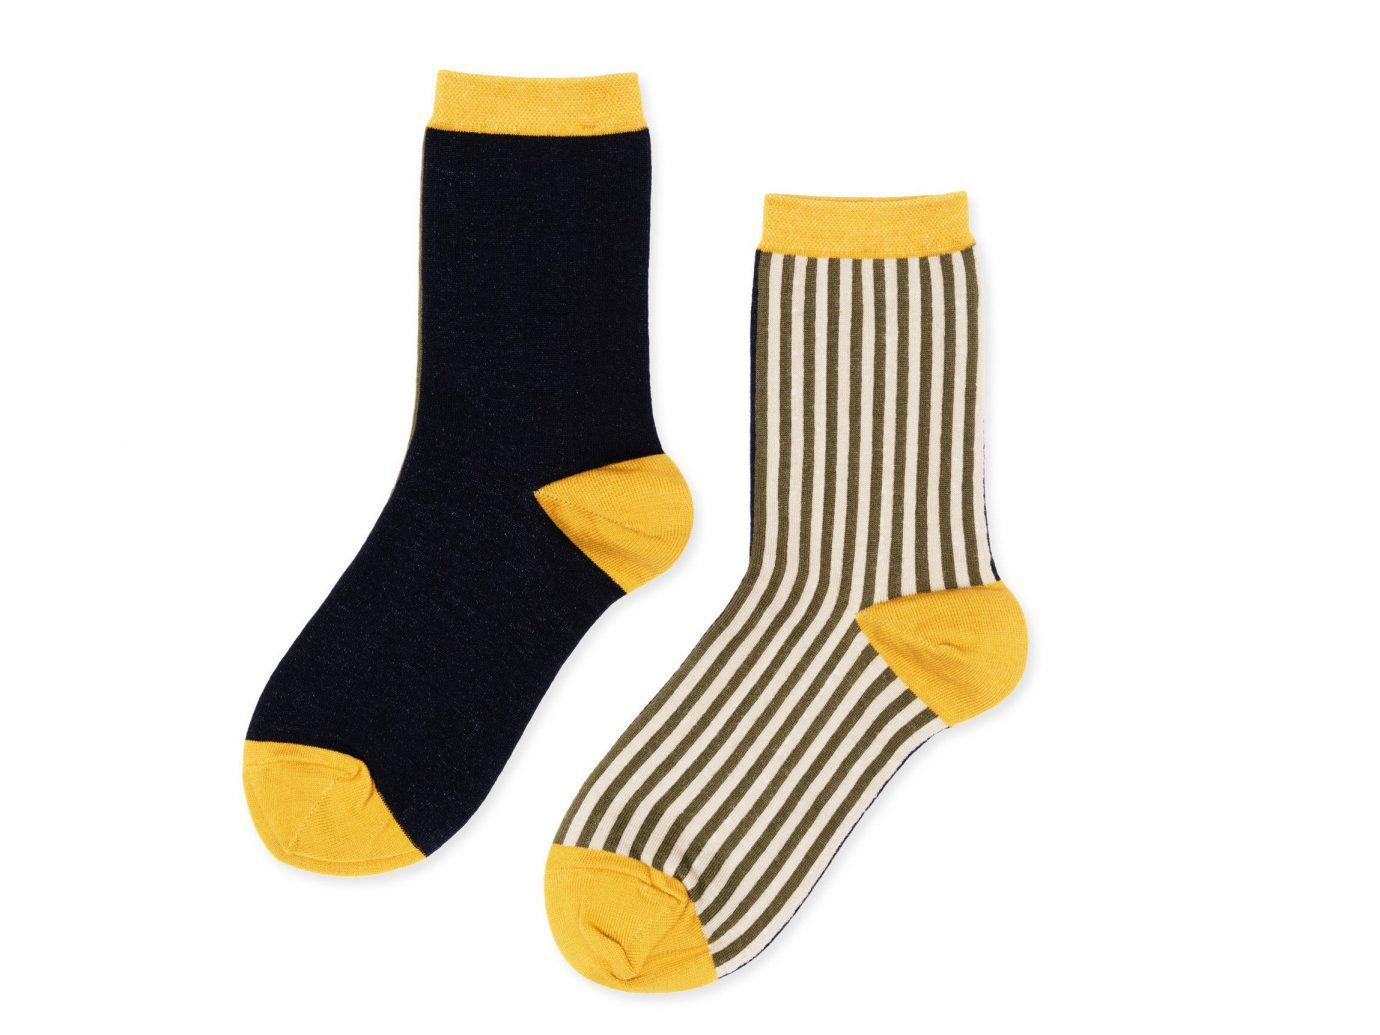 Style + Design sock yellow fashion accessory orange safety glove